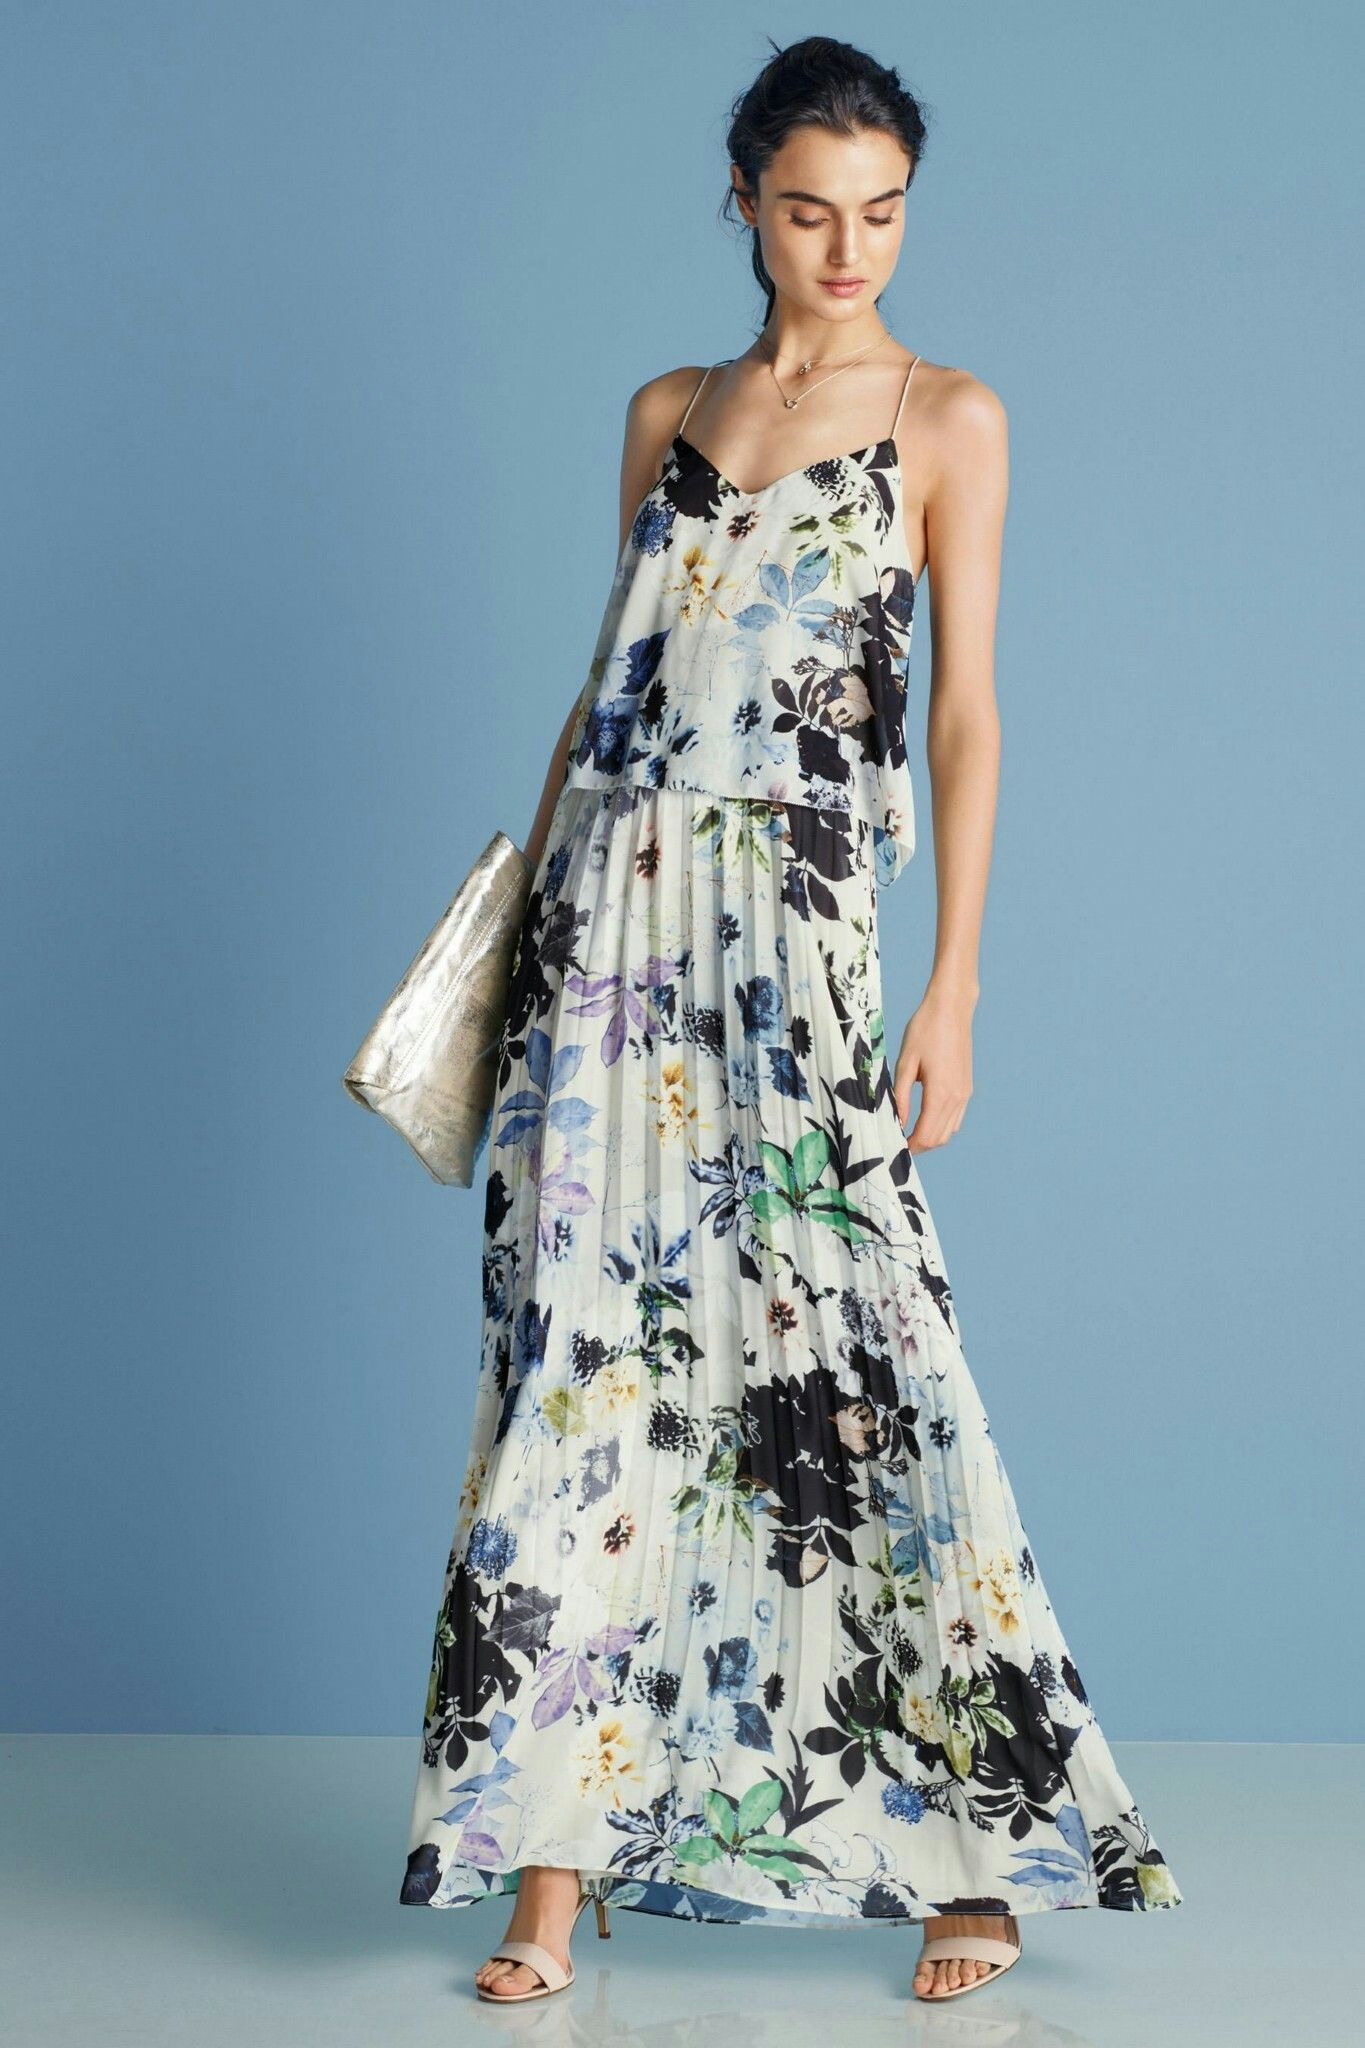 Next occassdion dress | Style Inspiration | Pinterest